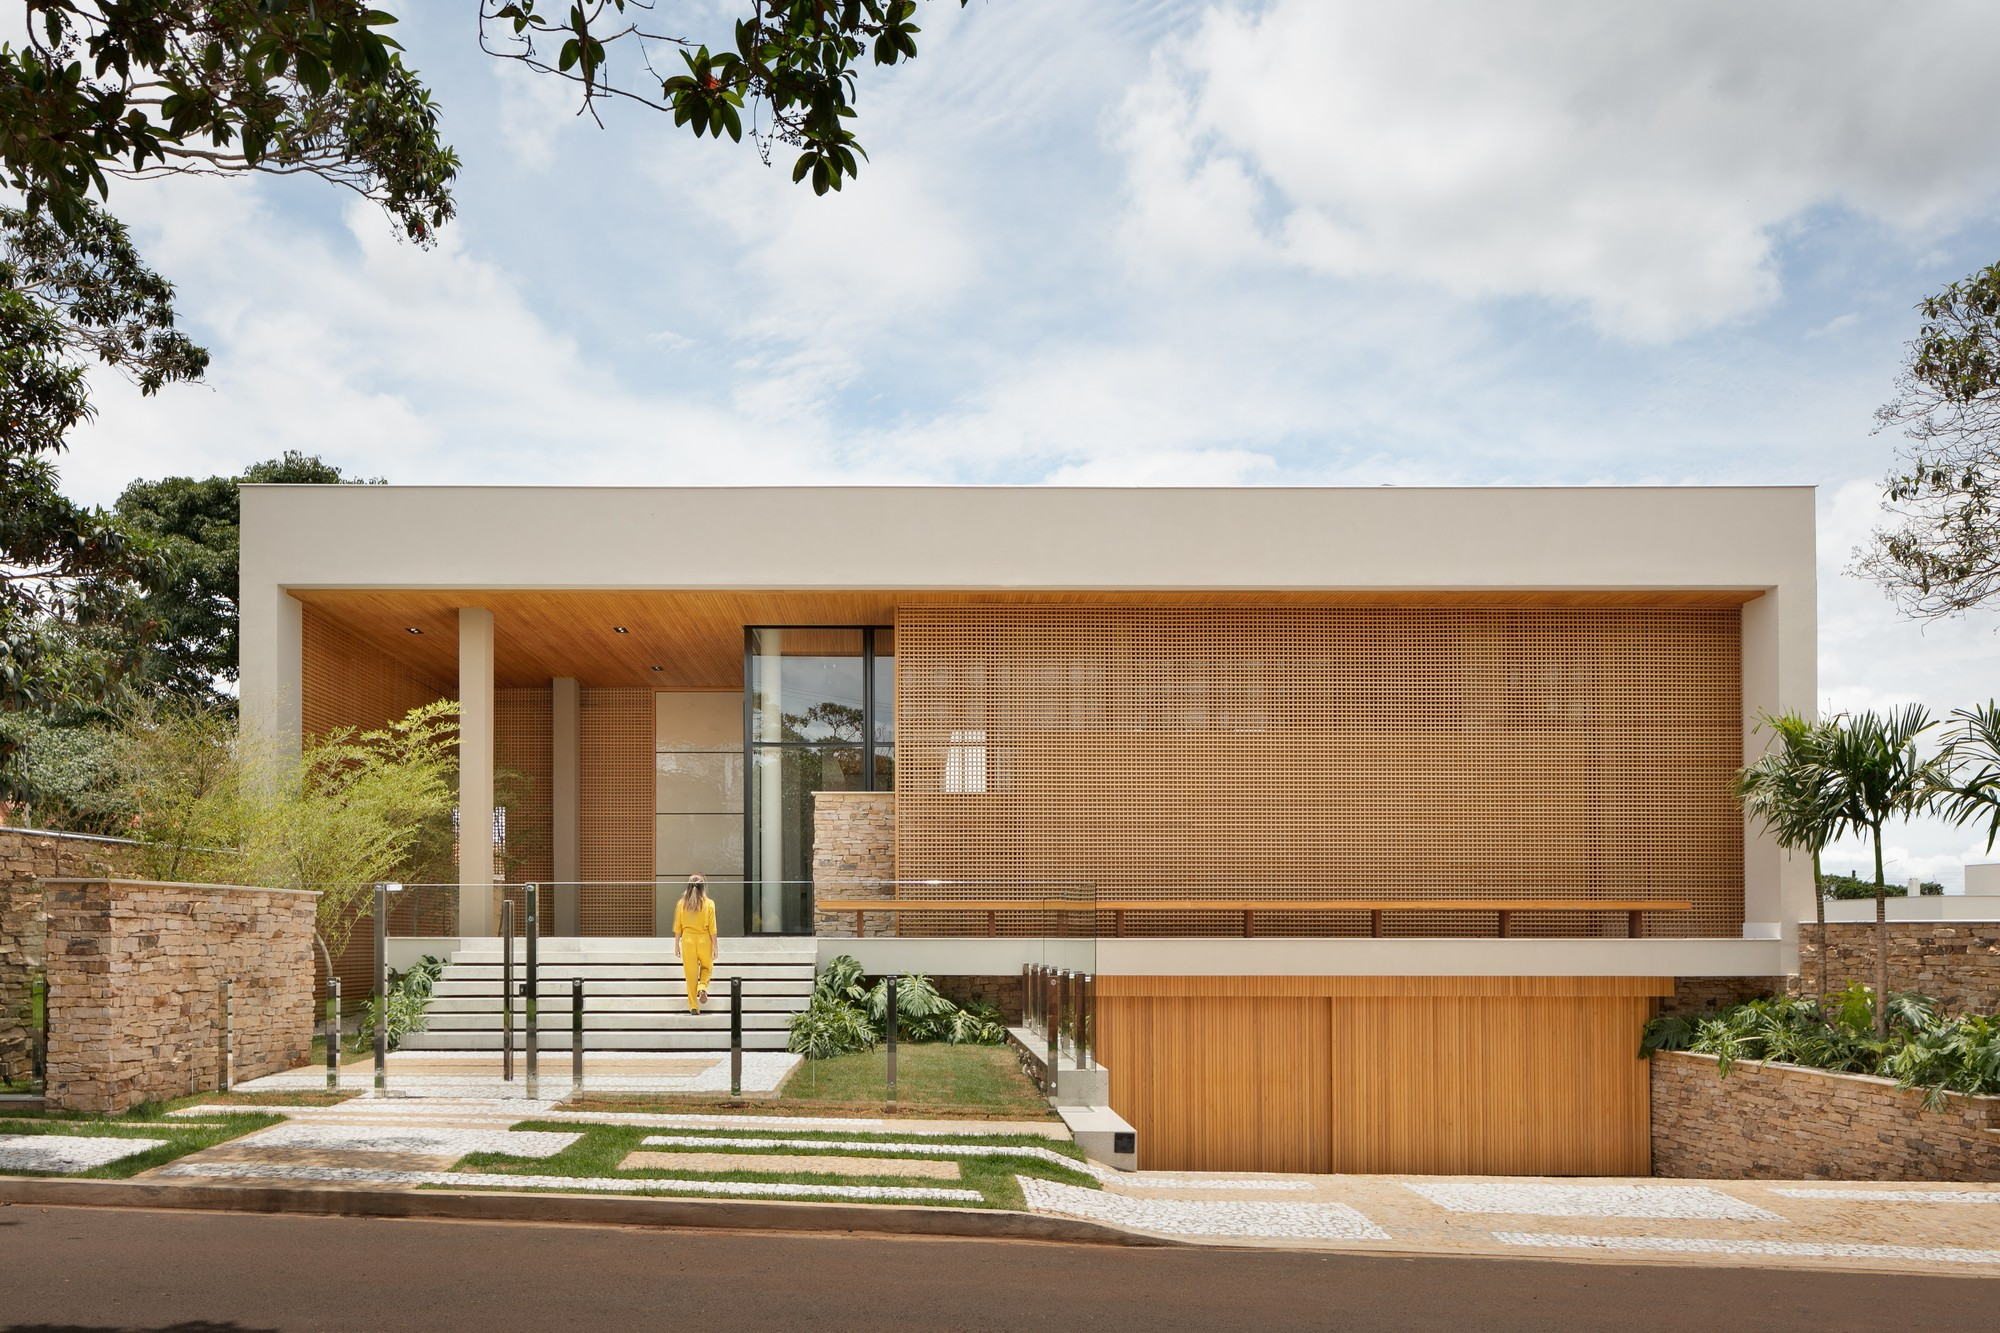 Bamboo House / BL Studio de Arquitetura